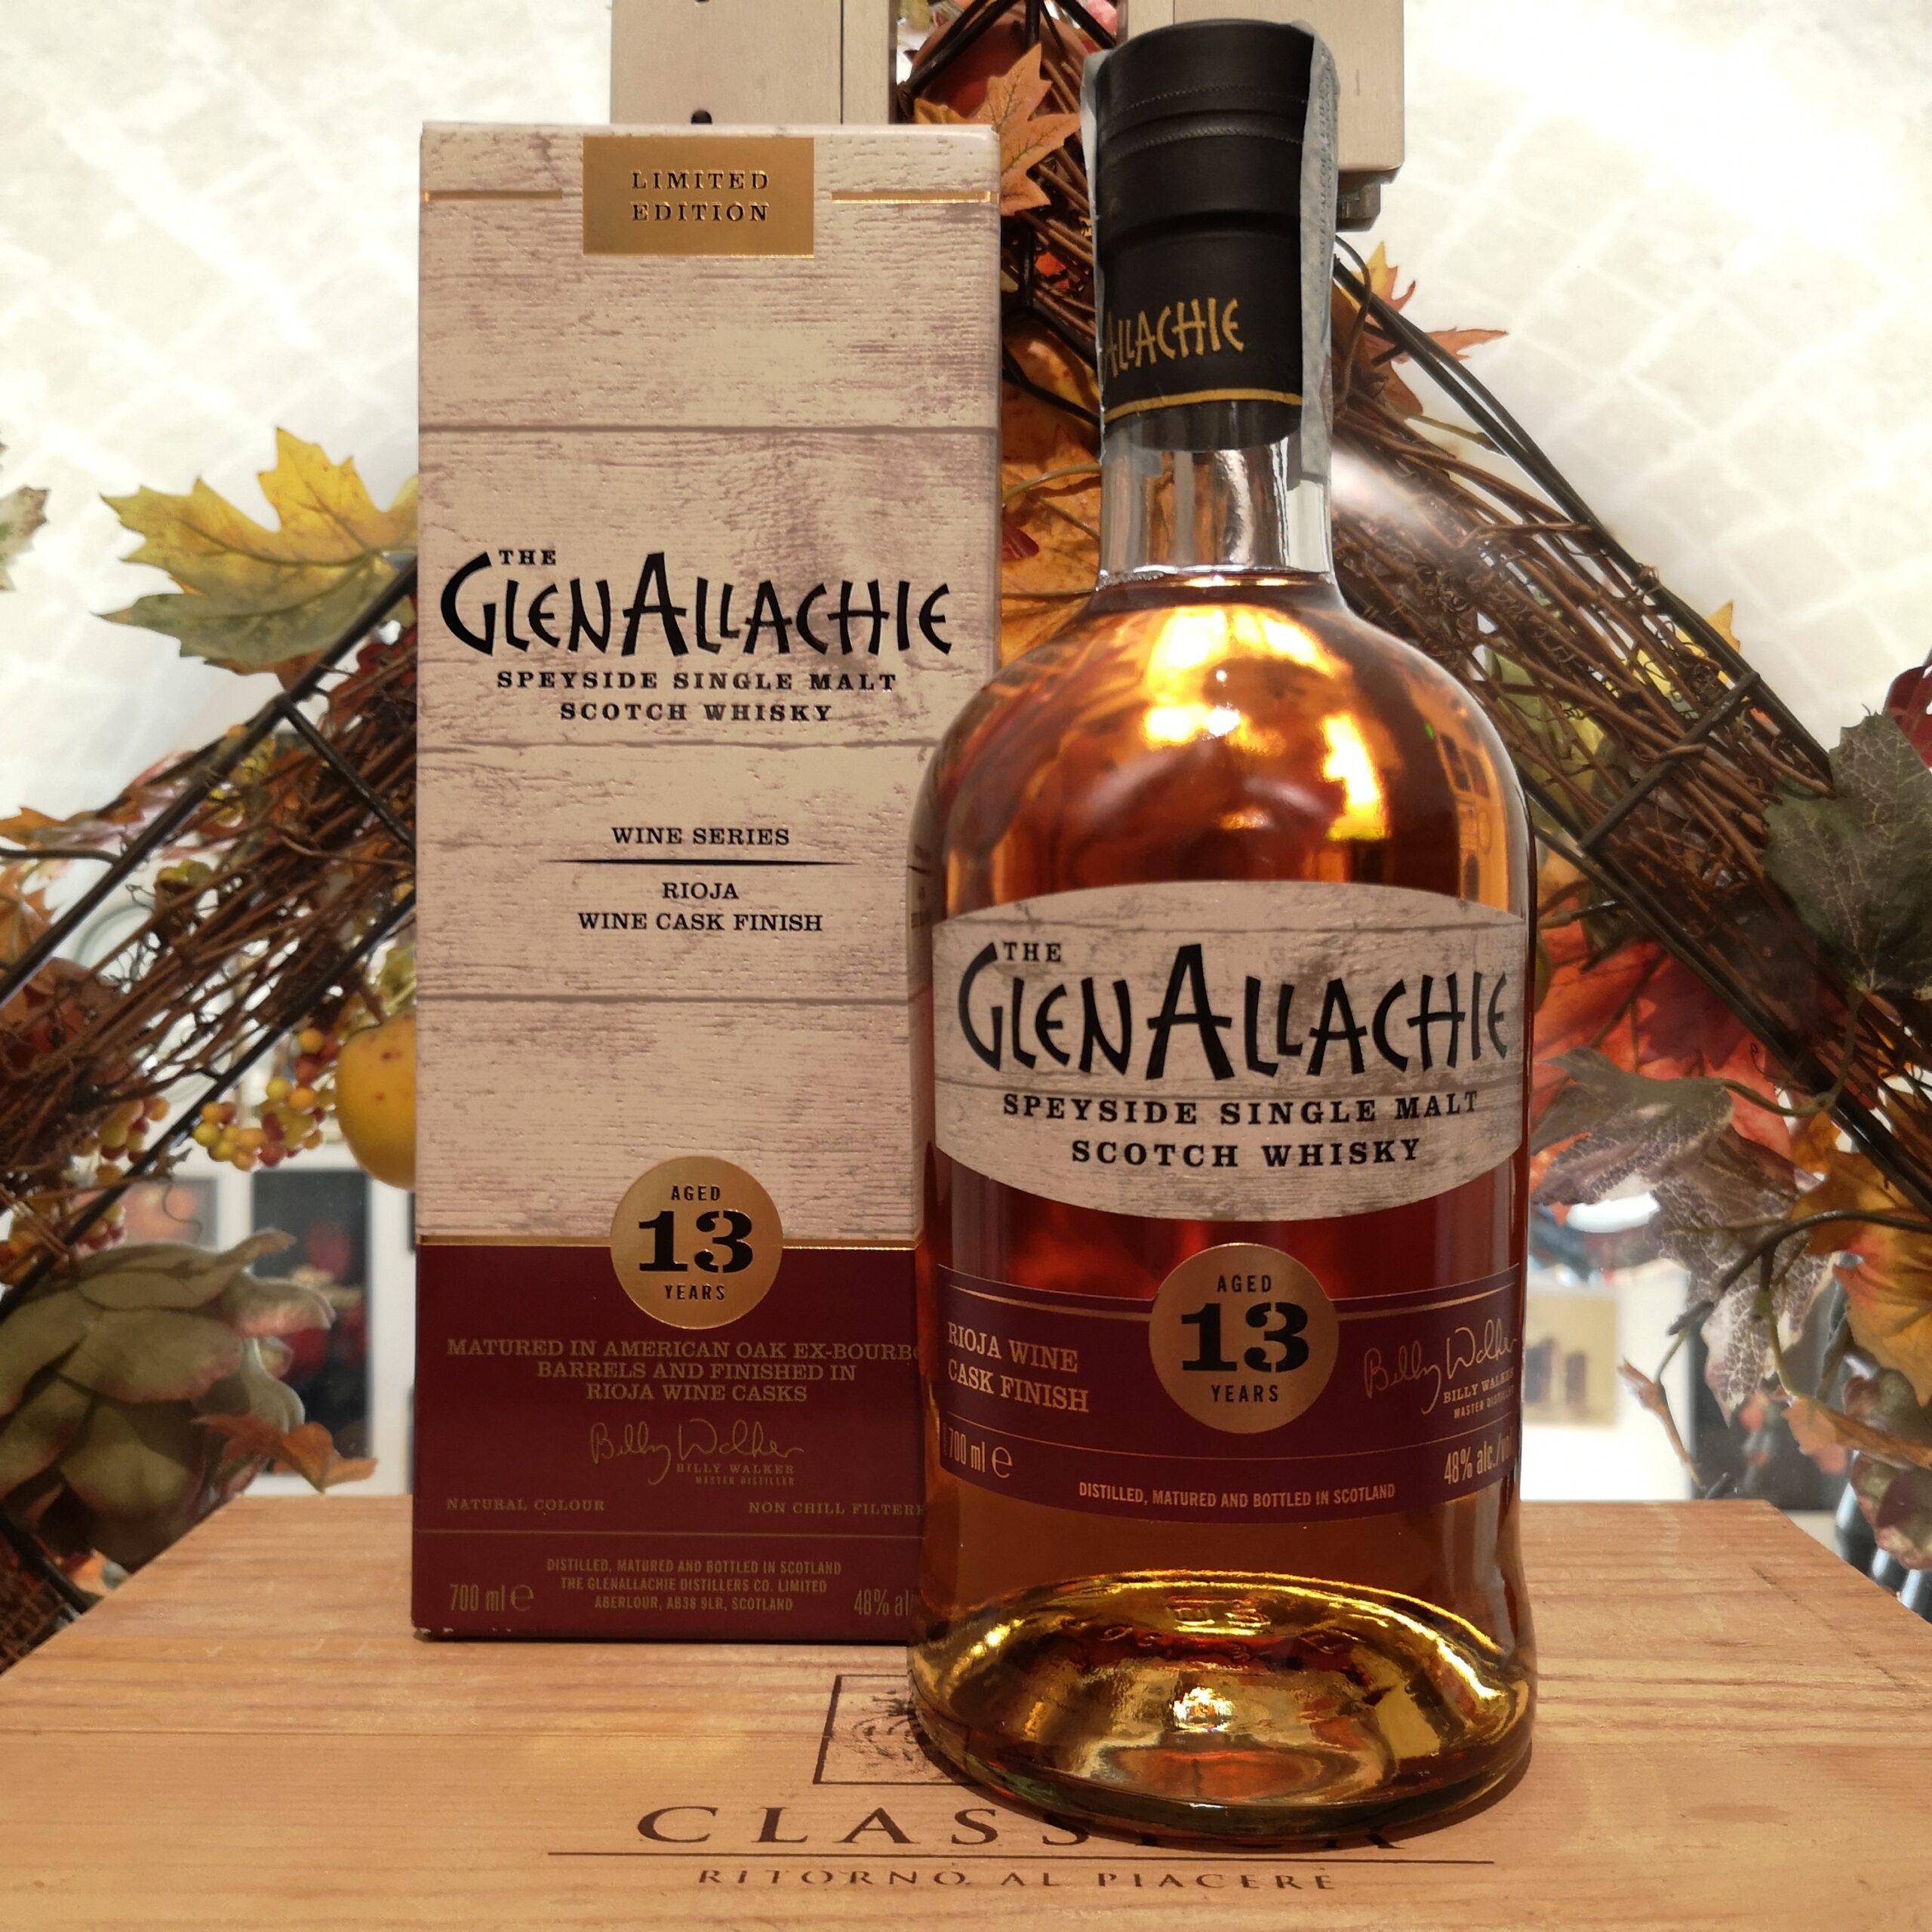 The GlenAllachie Speyside Single Malt Scotch Whisky 13 YO Rioja